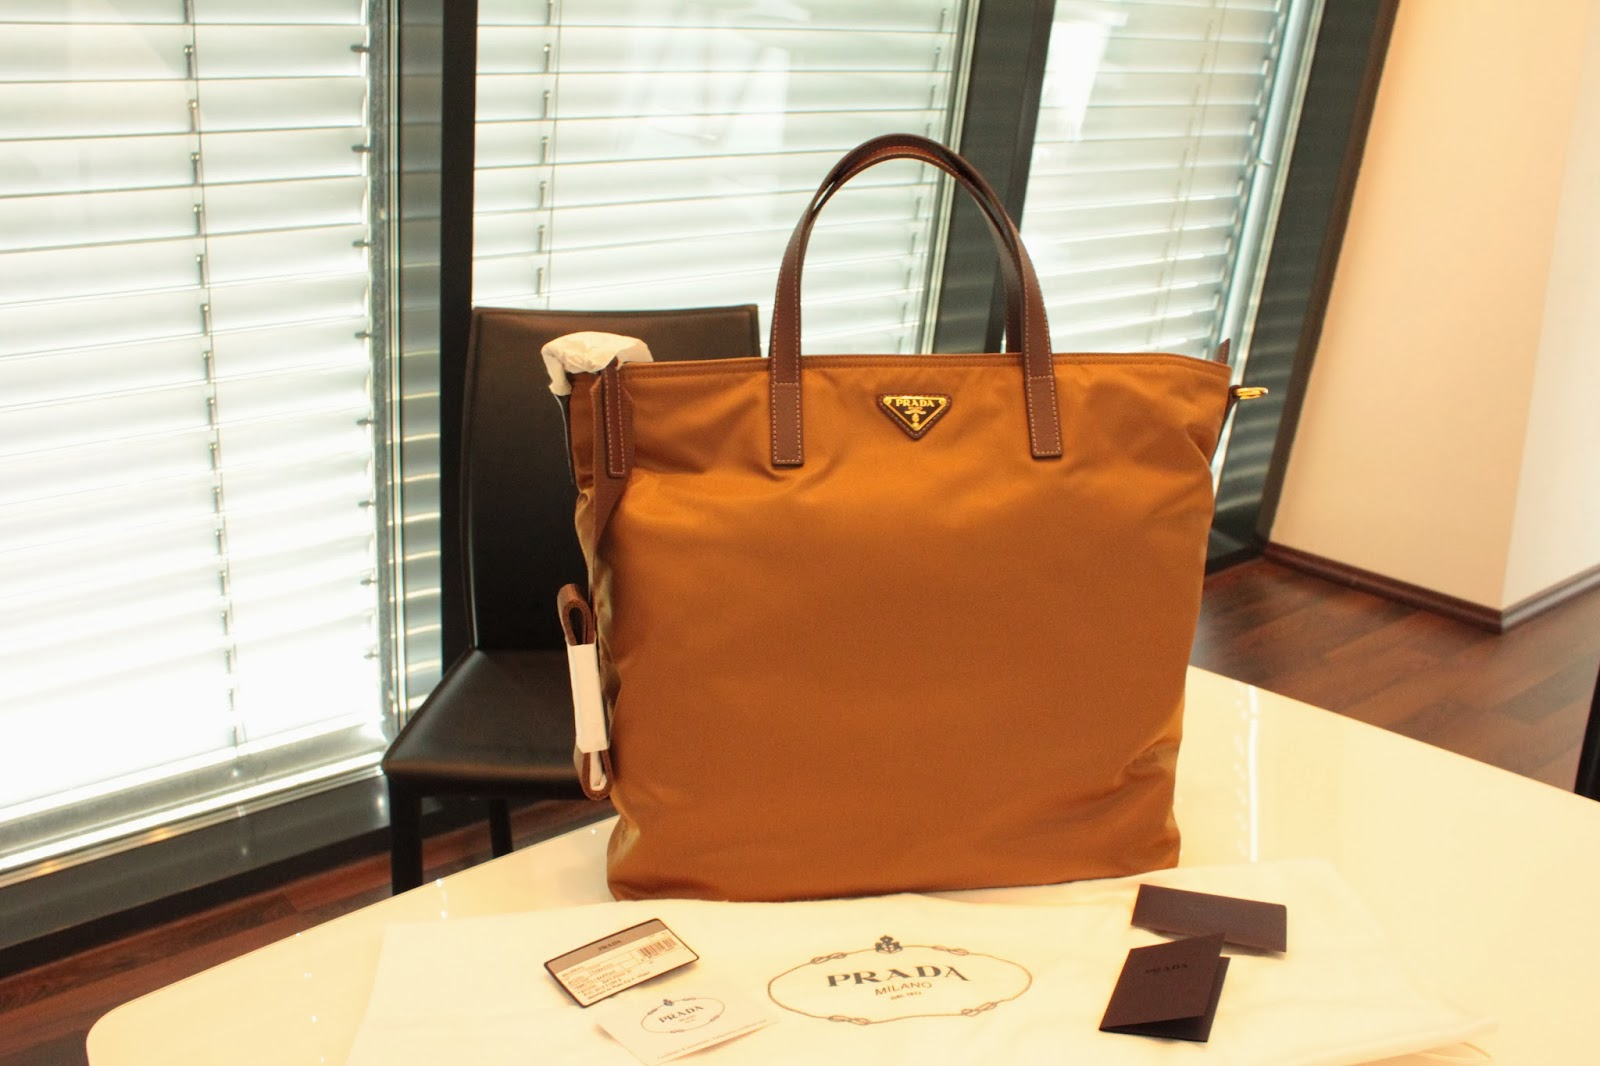 ... australia brand new authentic prada tessuto saffiano 2 way tote bag  bn2530 9f077 f0386 a35d4ef0395fa